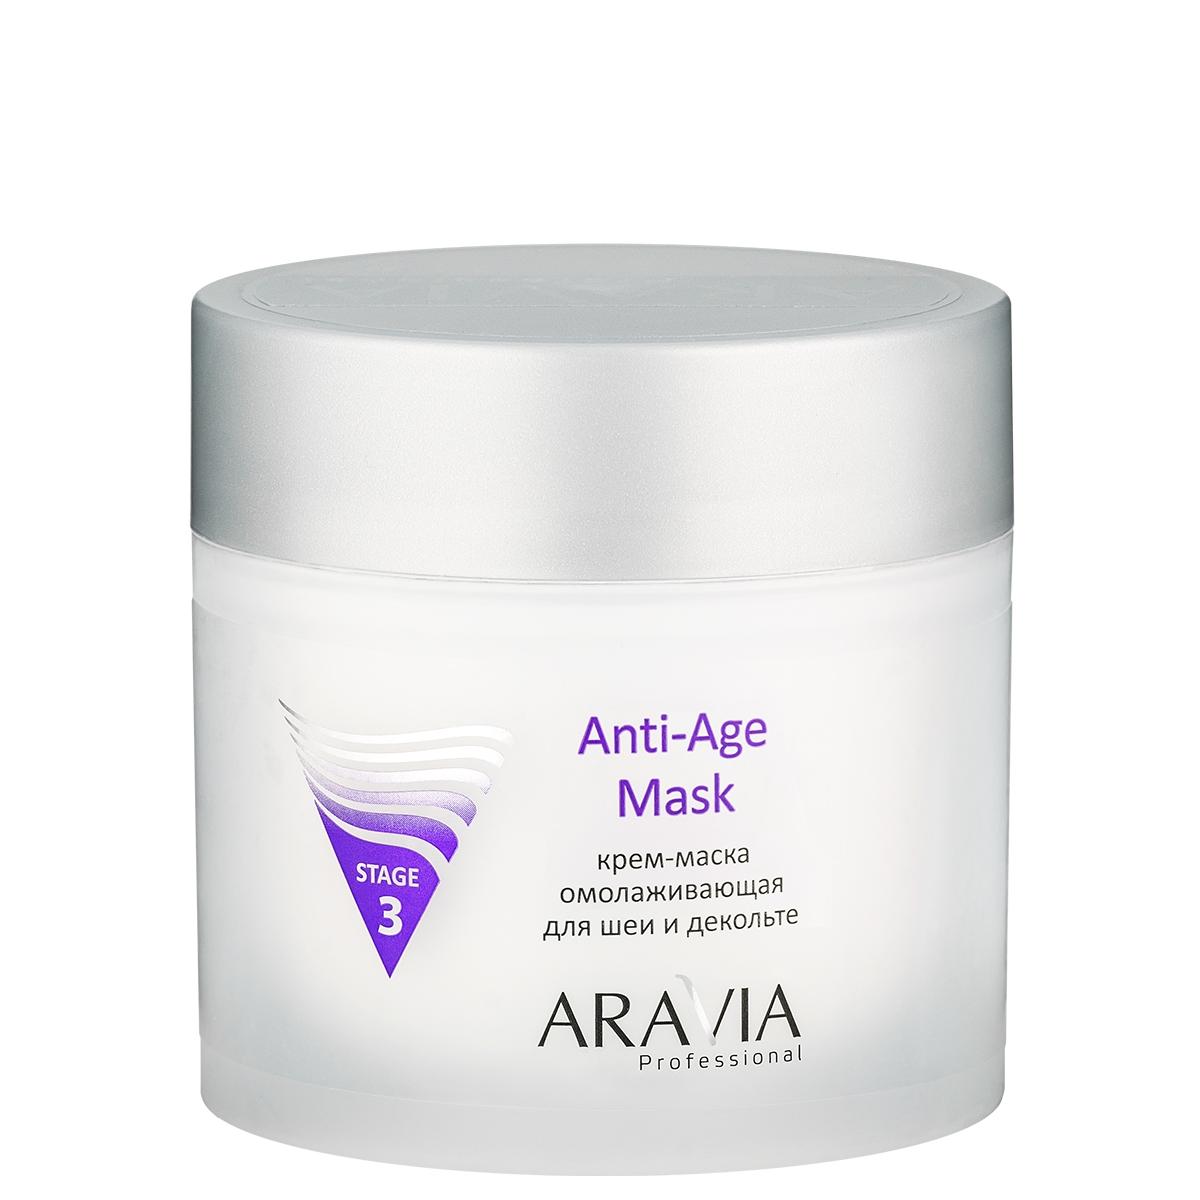 ARAVIA Крем-Маска Anti-Age Mask Омолаживающая для Шеи Декольте, 300 мл